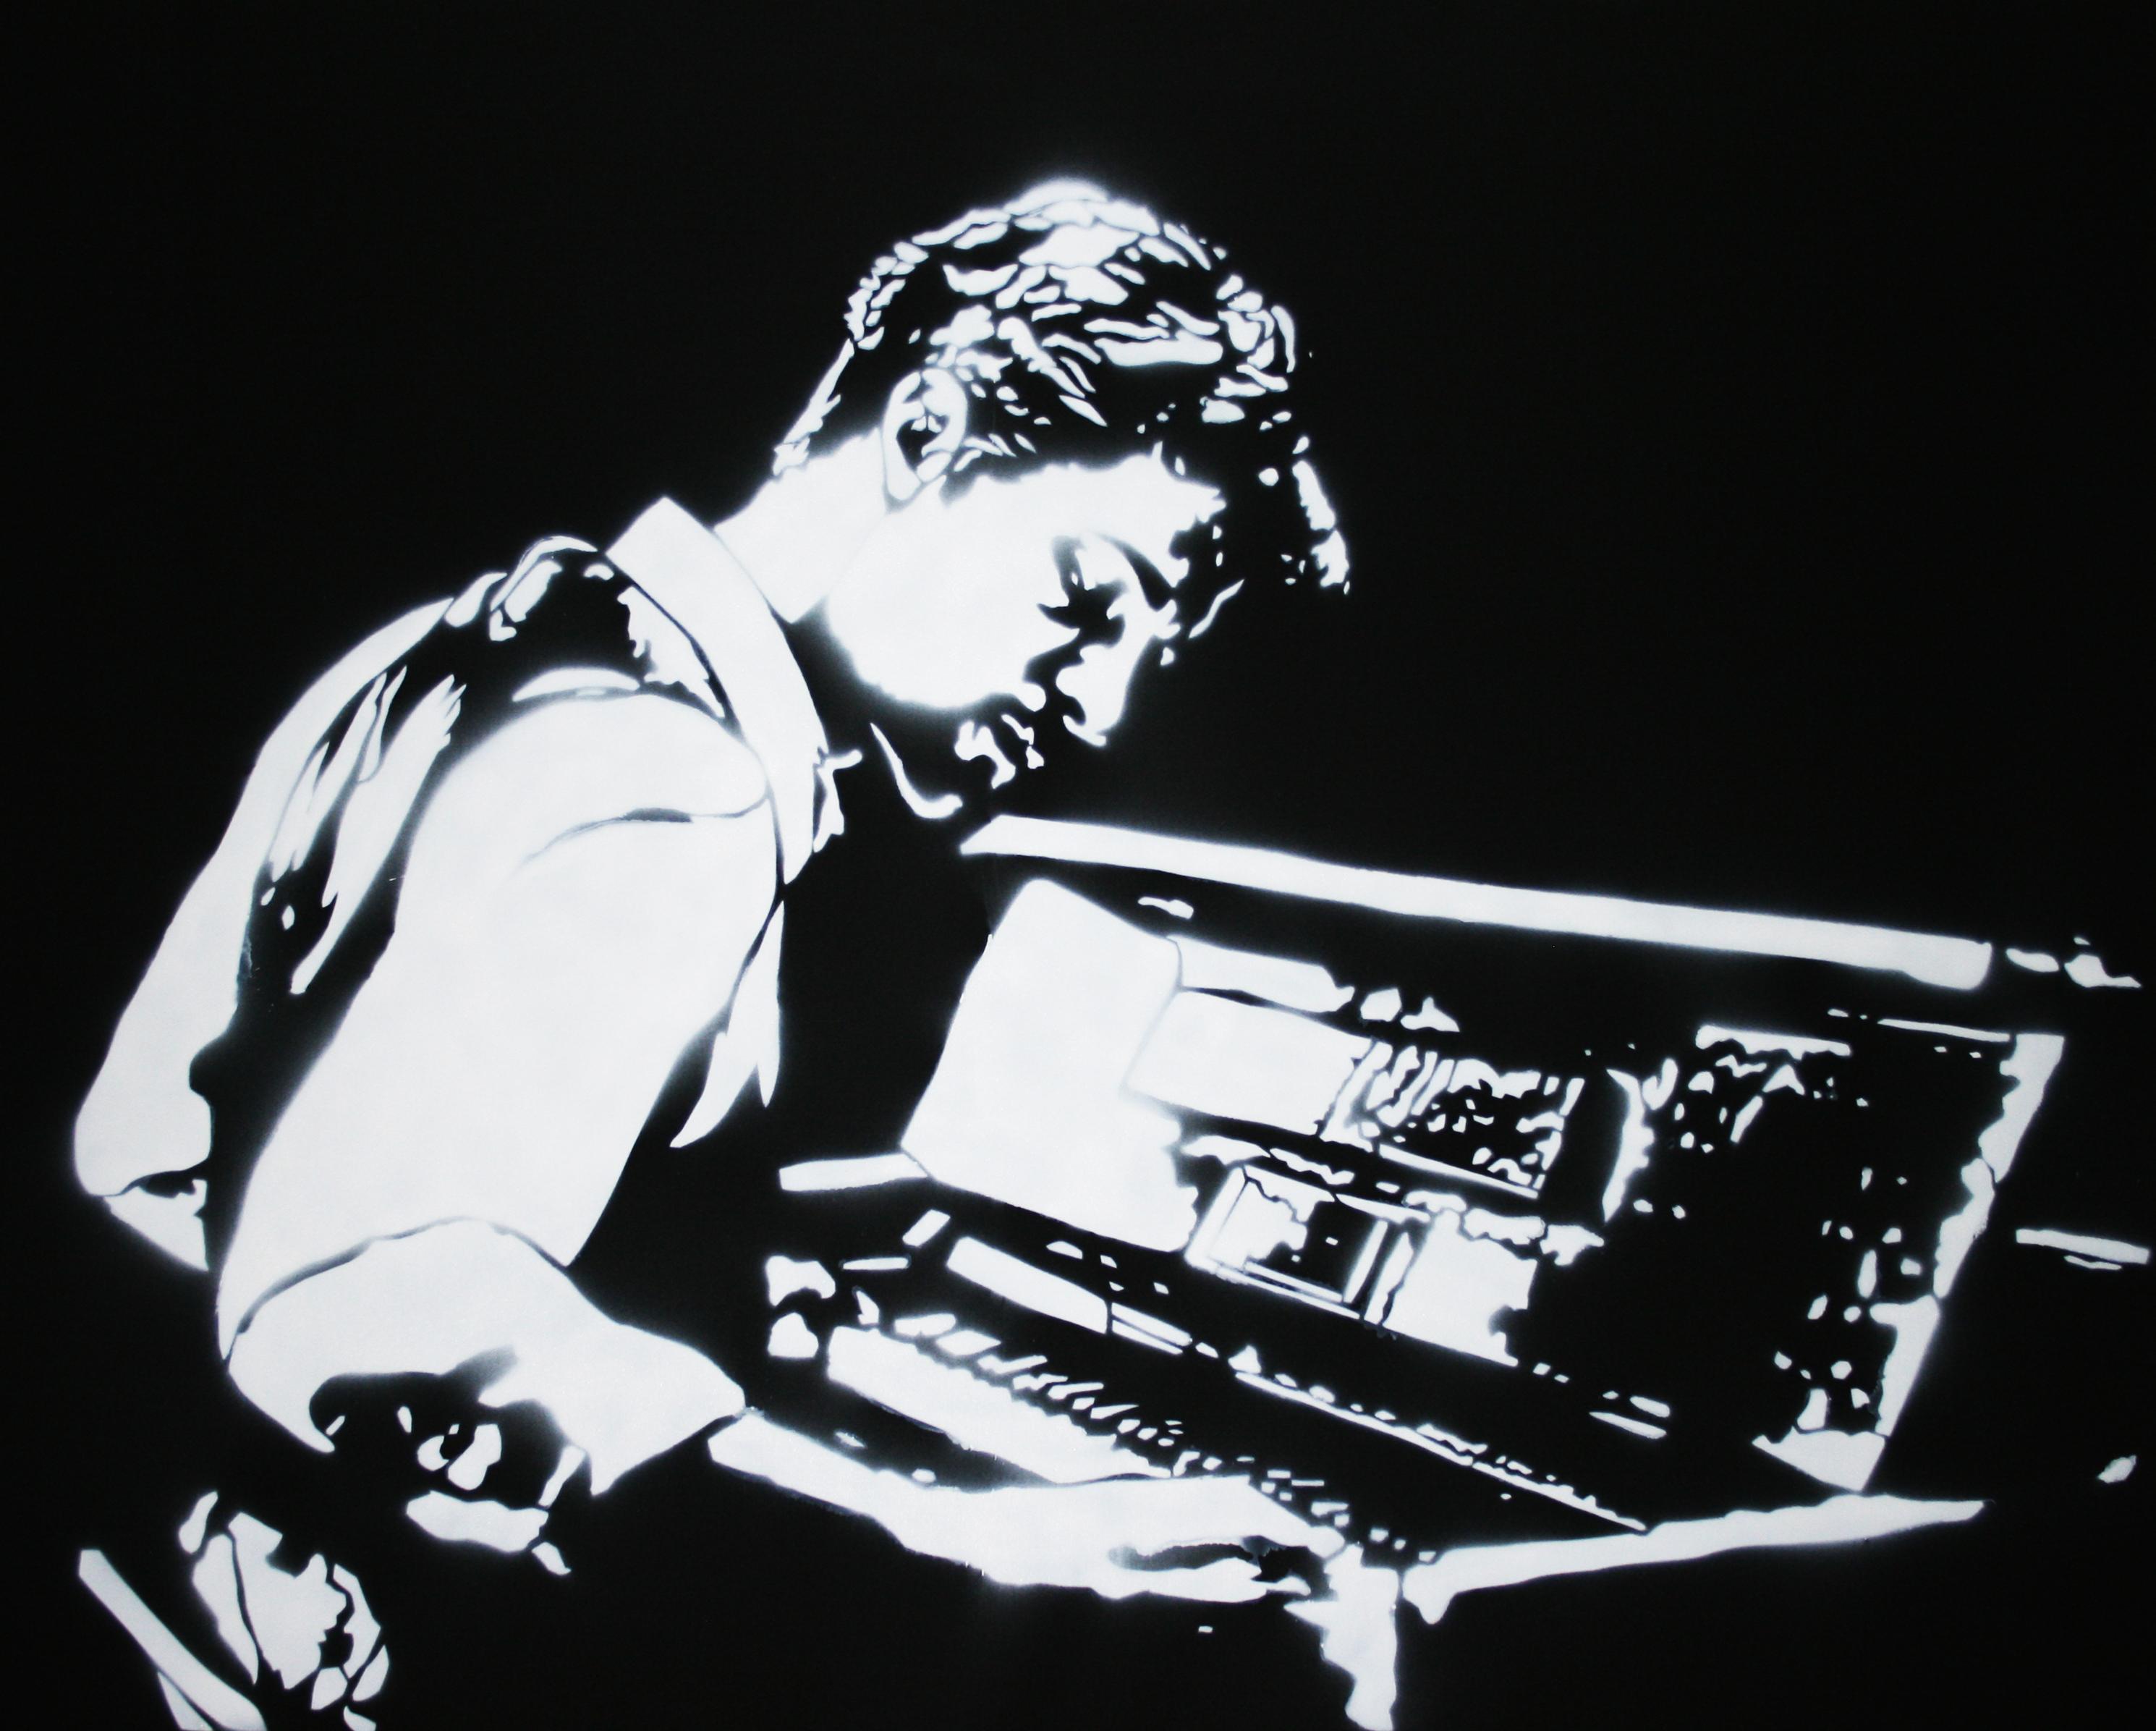 Bright Piano Nights